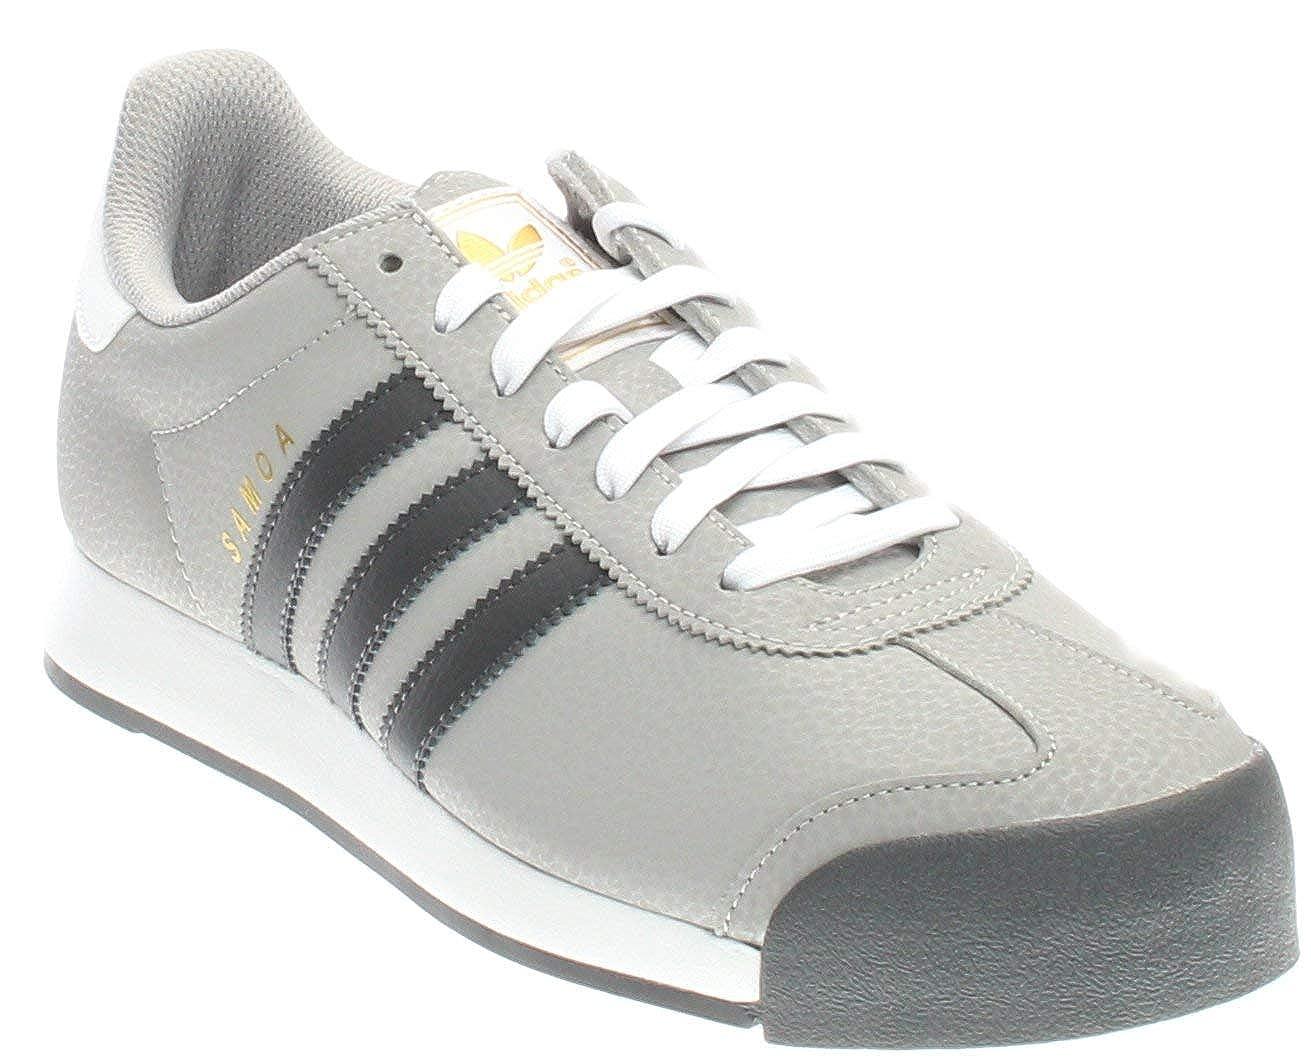 71318ac5 Amazon.com | adidas Samoa Grey | Fashion Sneakers